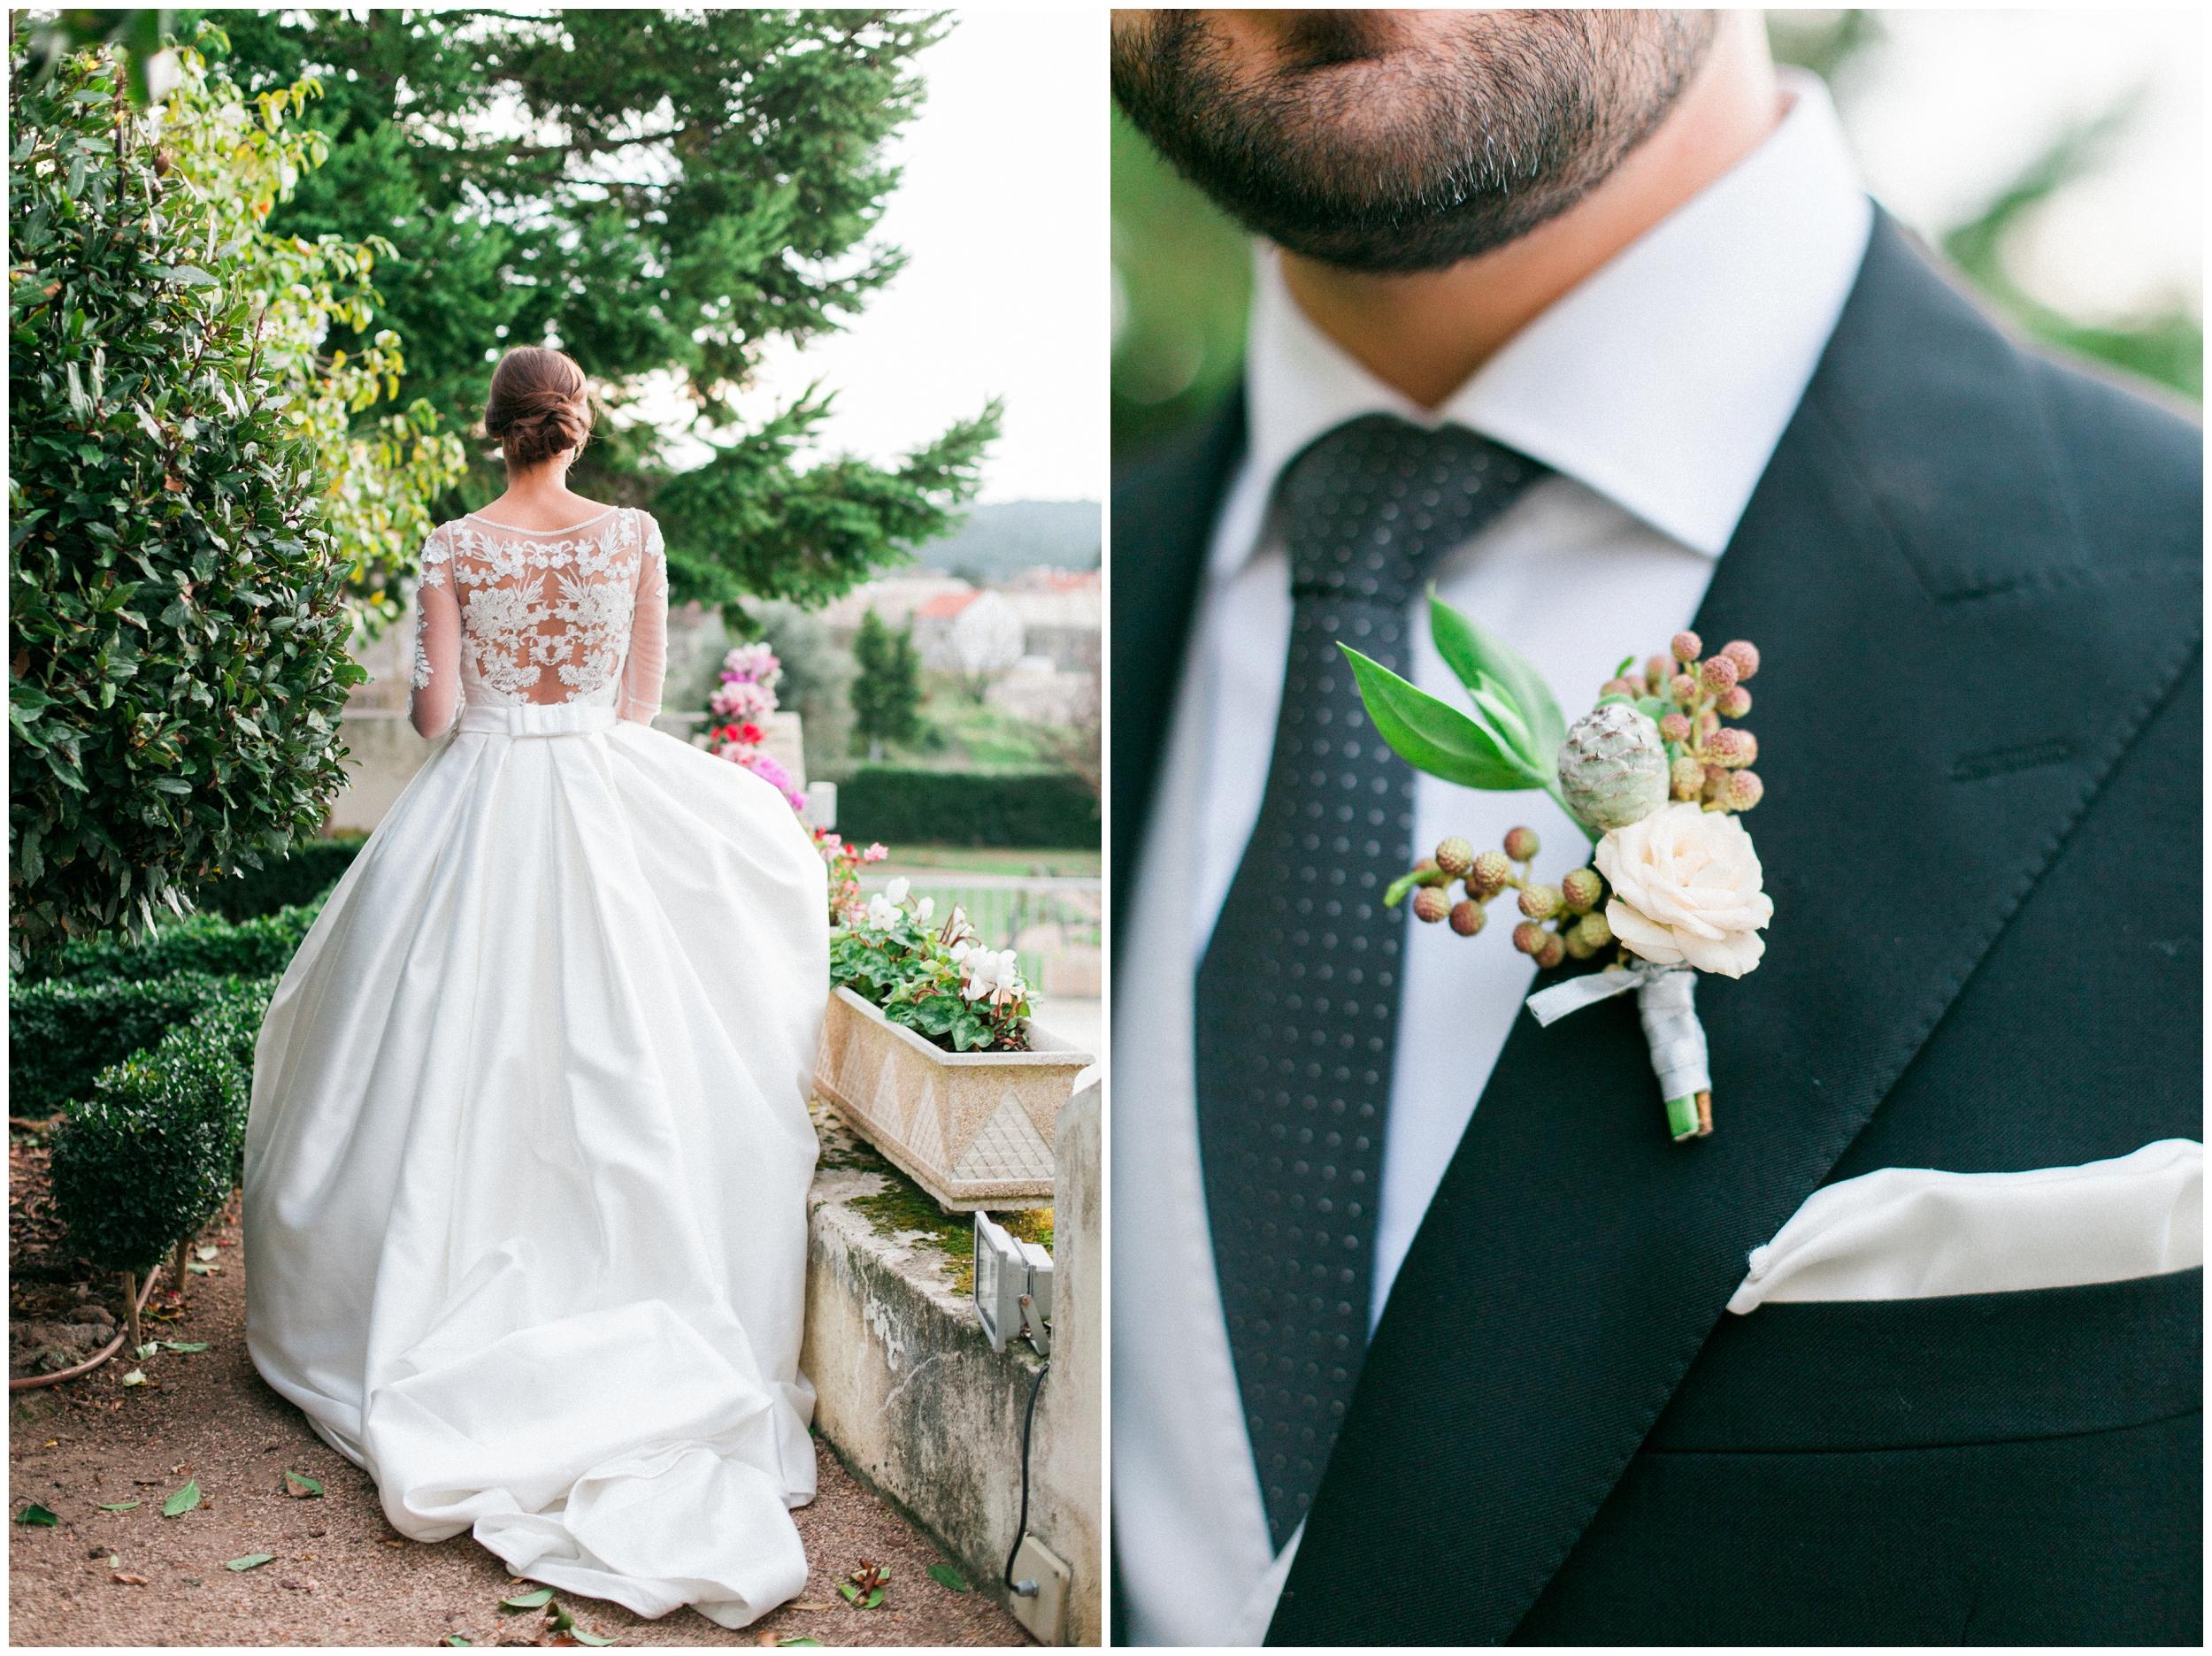 maria+rao+photography+wedding+palacio+lousa_0012.jpg